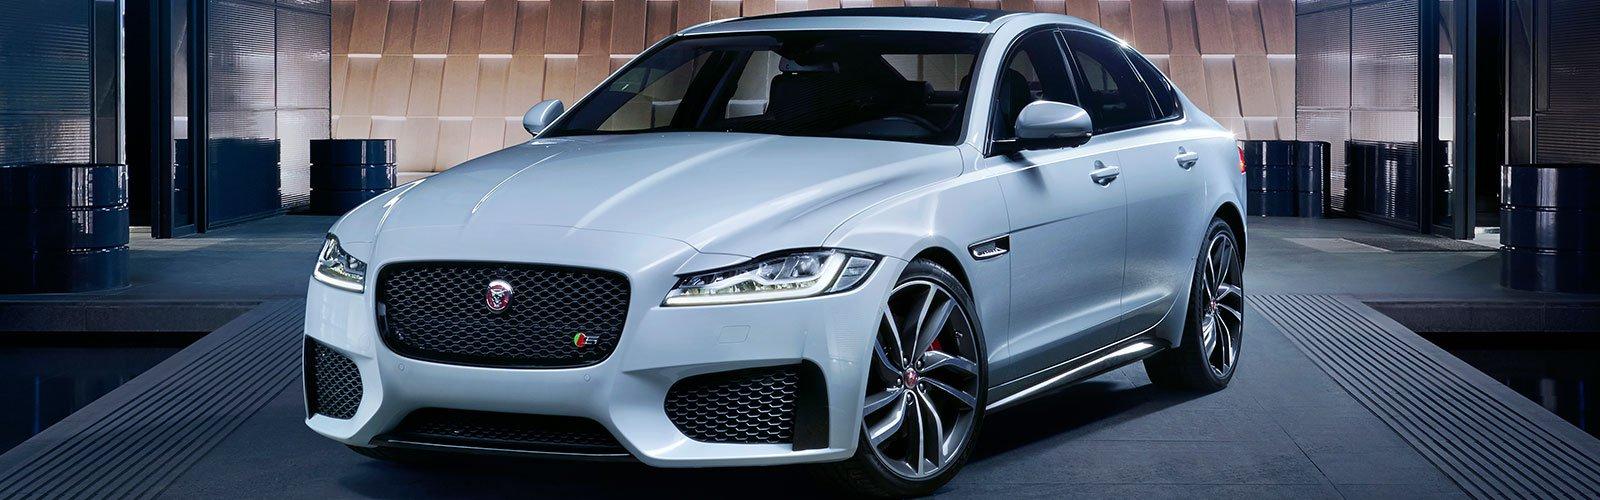 2020 Jaguar Xf Rs Price